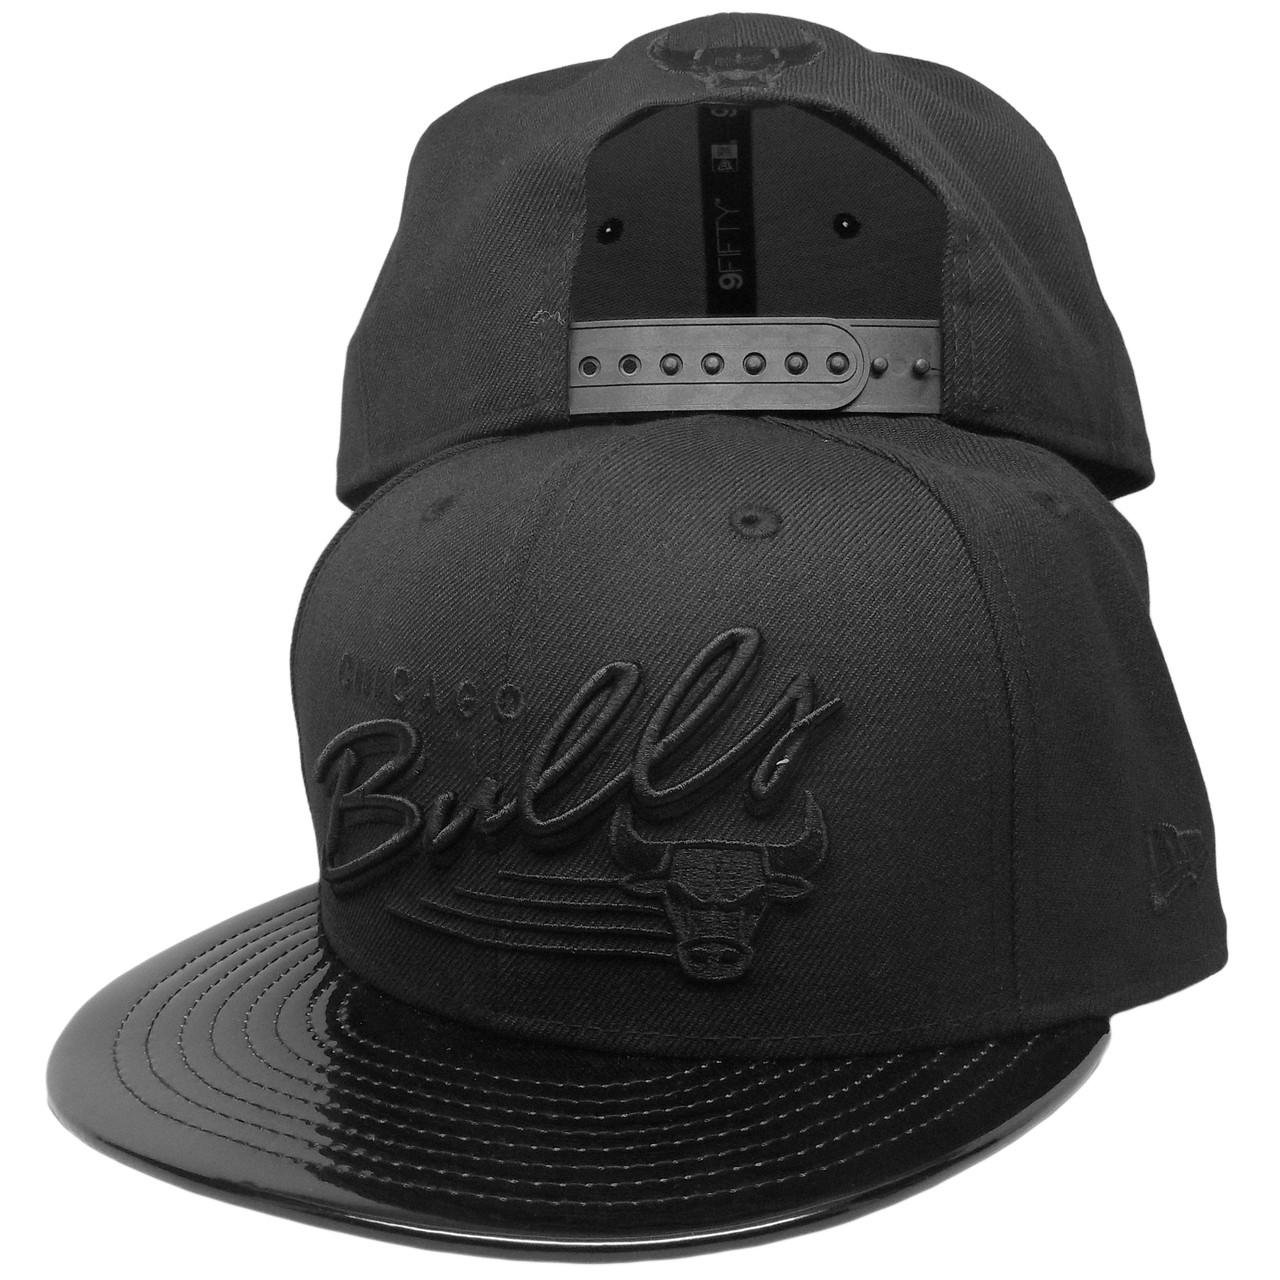 96d93040ec1077 Chicago Bulls New Era Custom 9Fifty Snapback Hat - Black, Black Patent  Leather - ECapsUnlimited.com